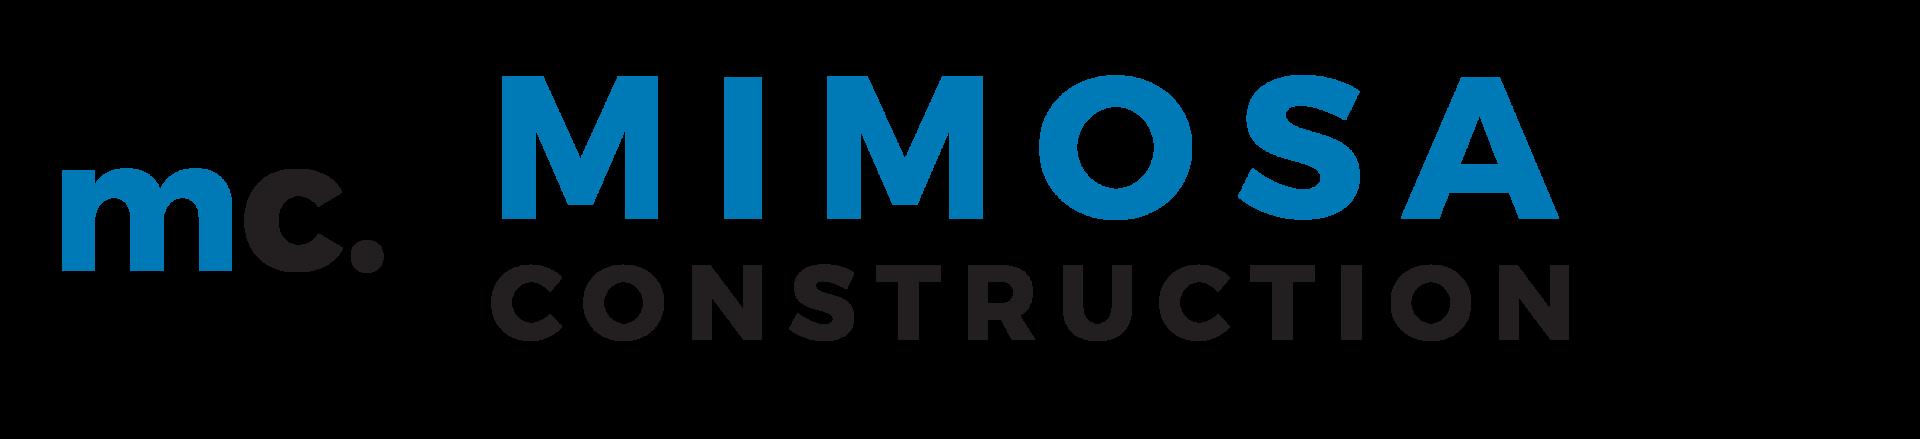 Mimosa Construction